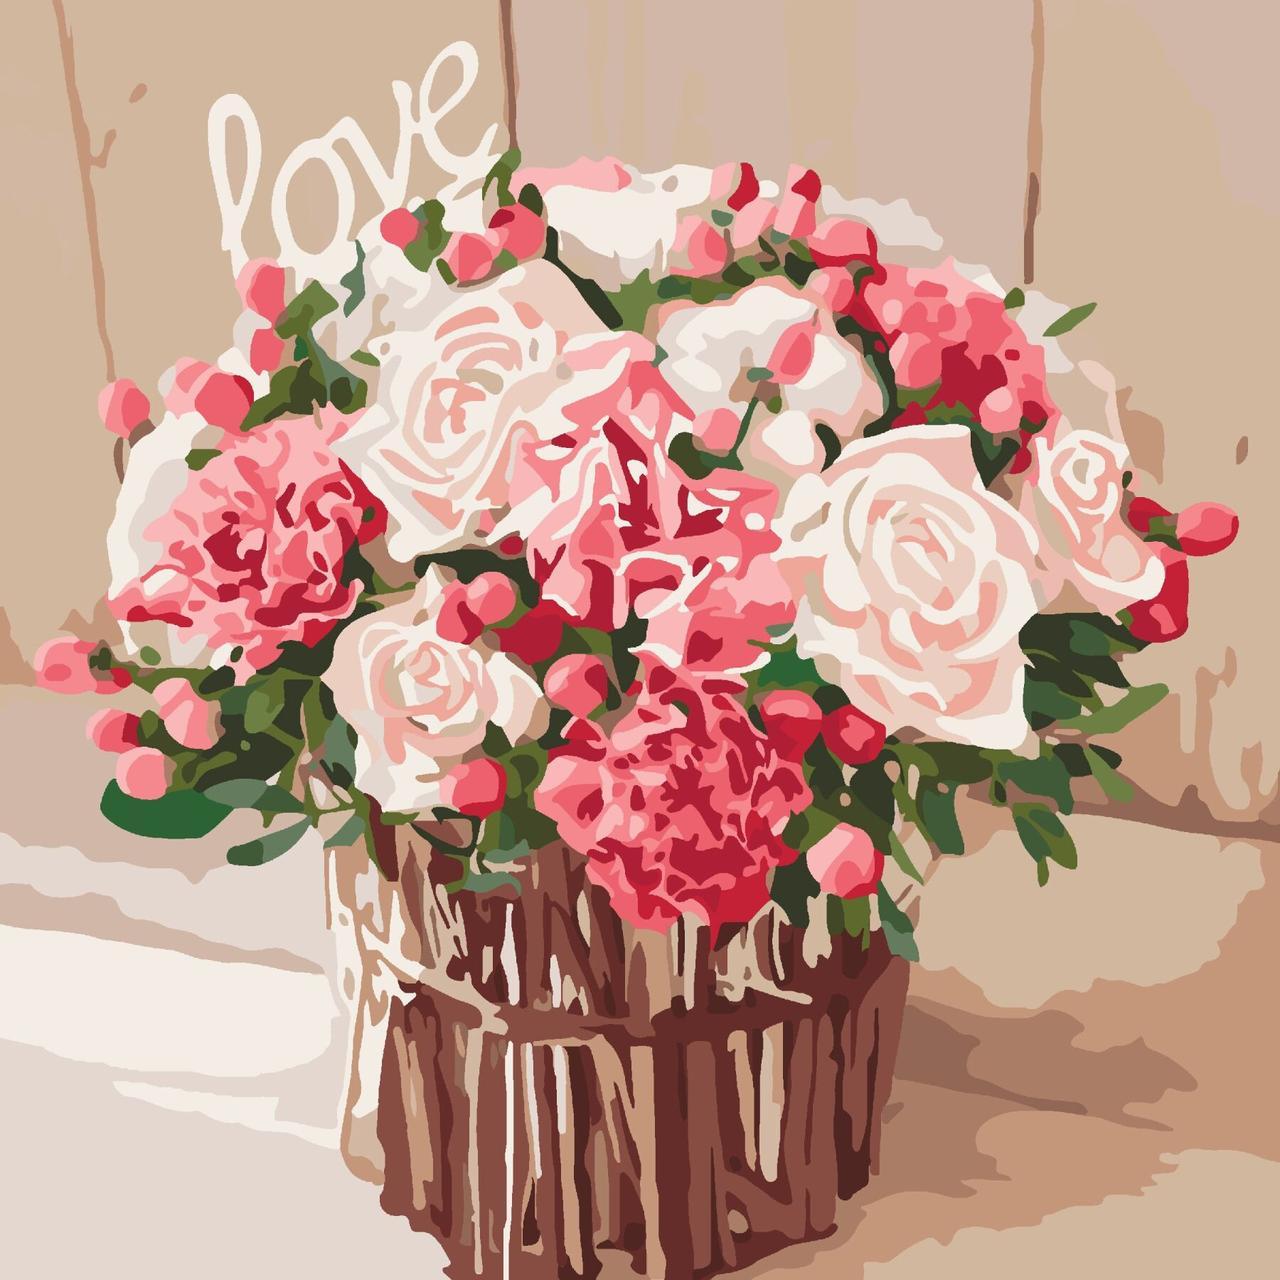 КНО2074 Раскраска по номерам Розы любви, Без коробки